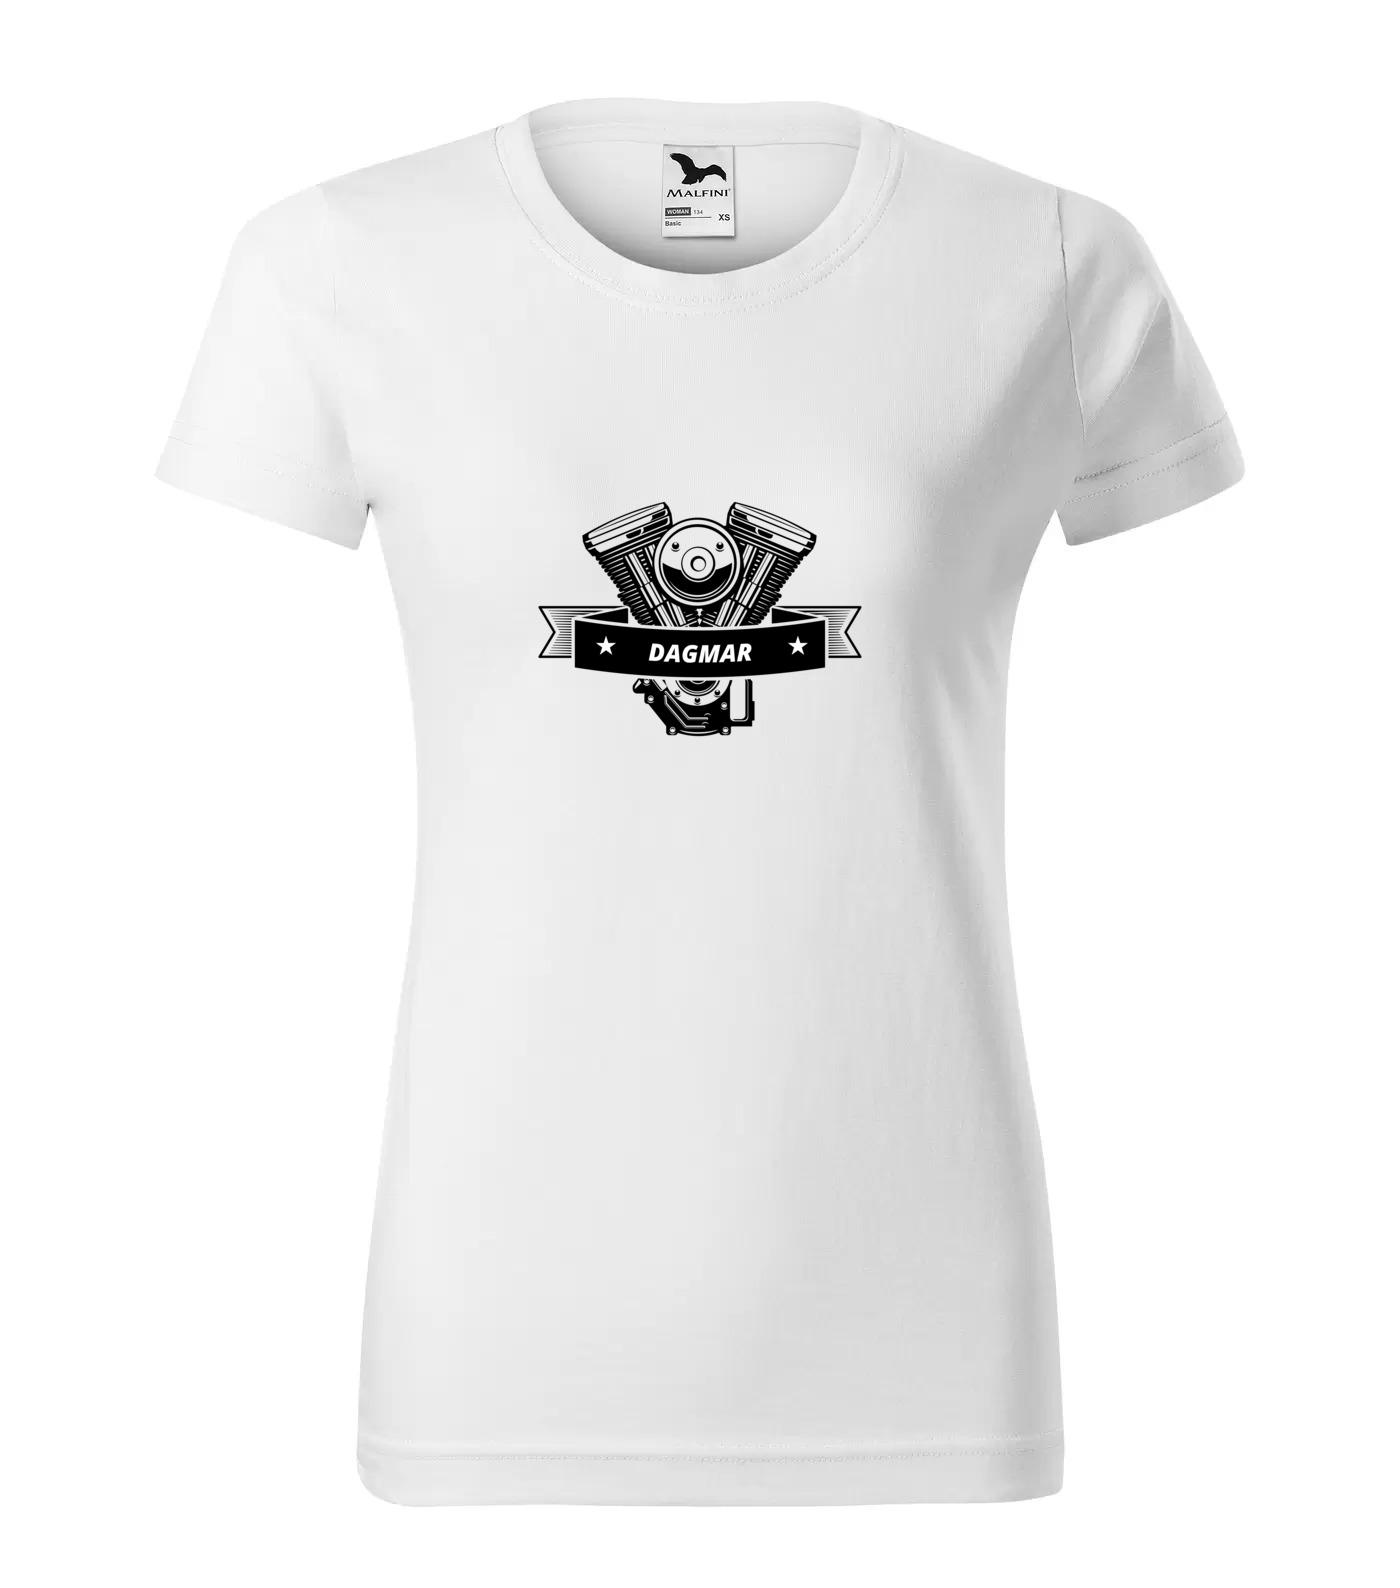 Tričko Motorkářka Dagmar